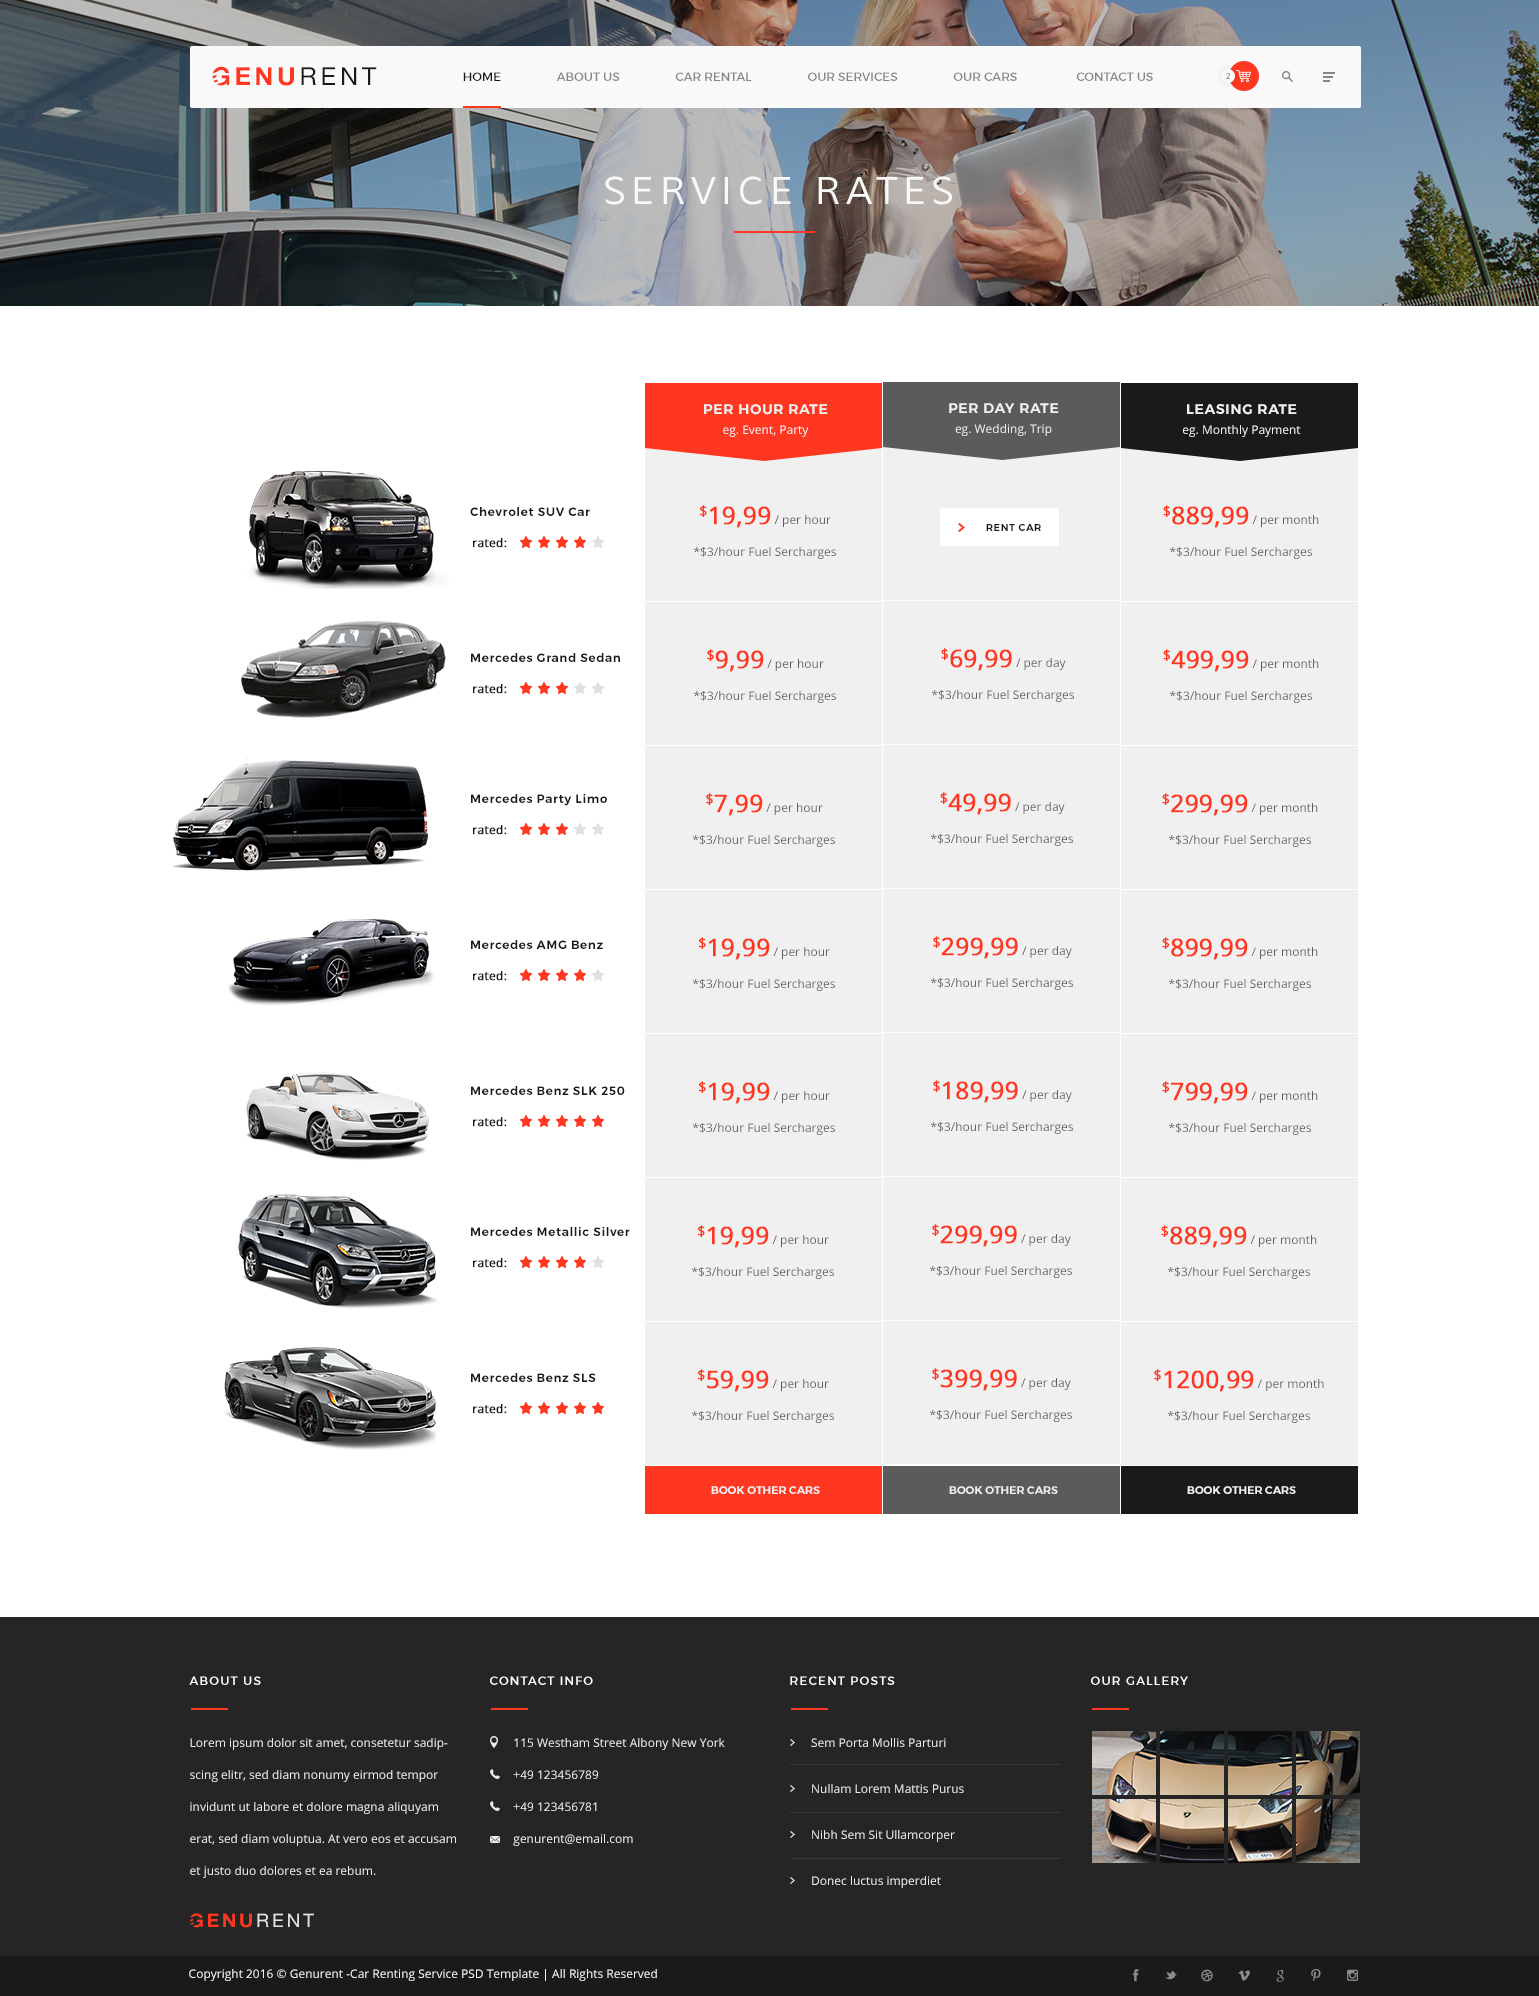 Genurent Car Rental Service Psd Template By Kl Webmedia Themeforest